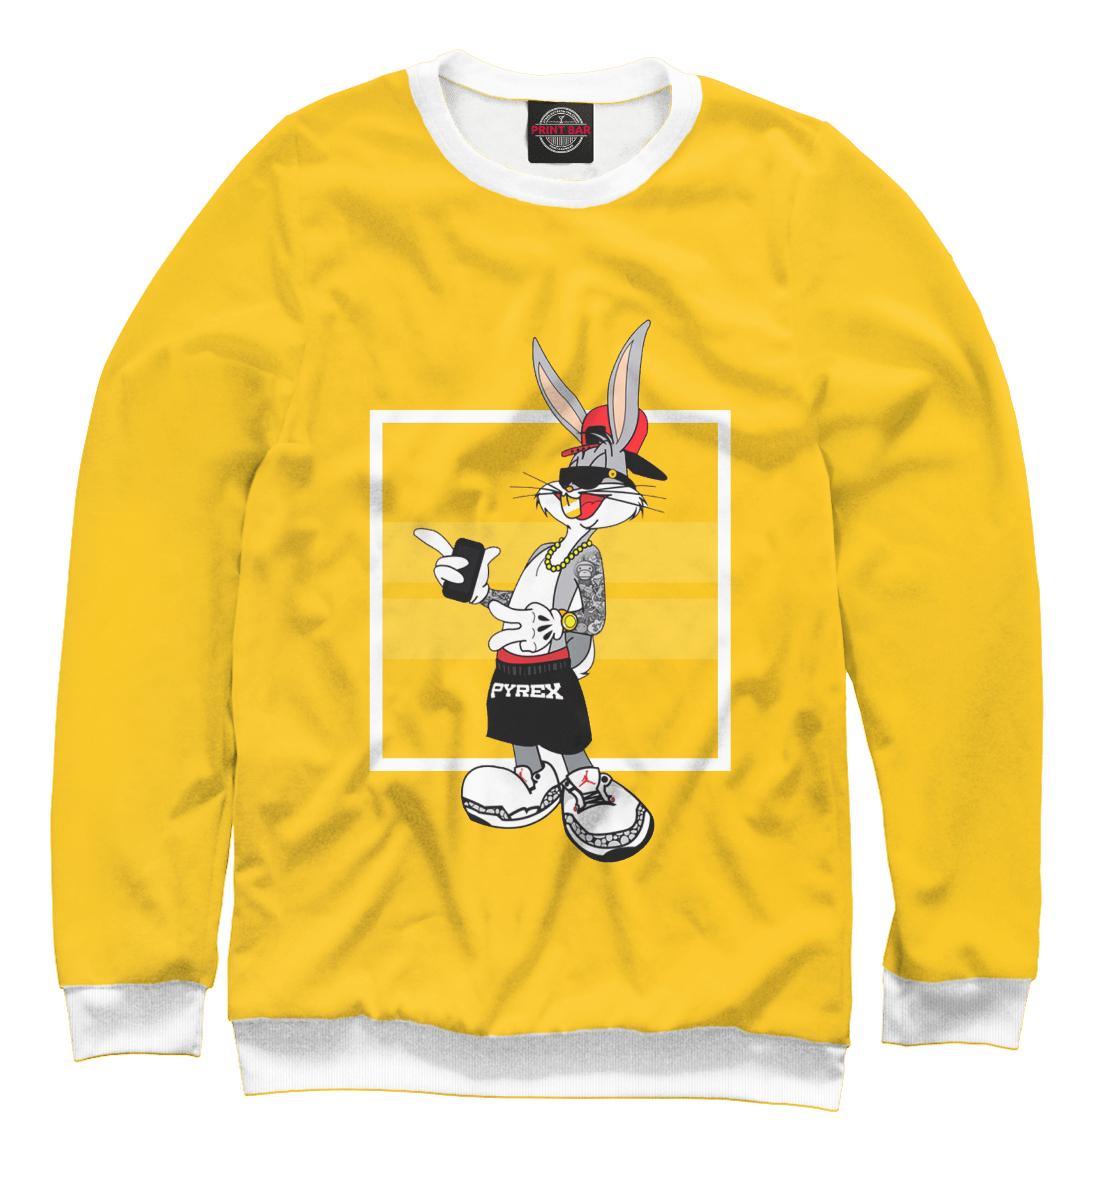 Купить Bugs Bunny, Printbar, Свитшоты, MFR-480676-swi-1